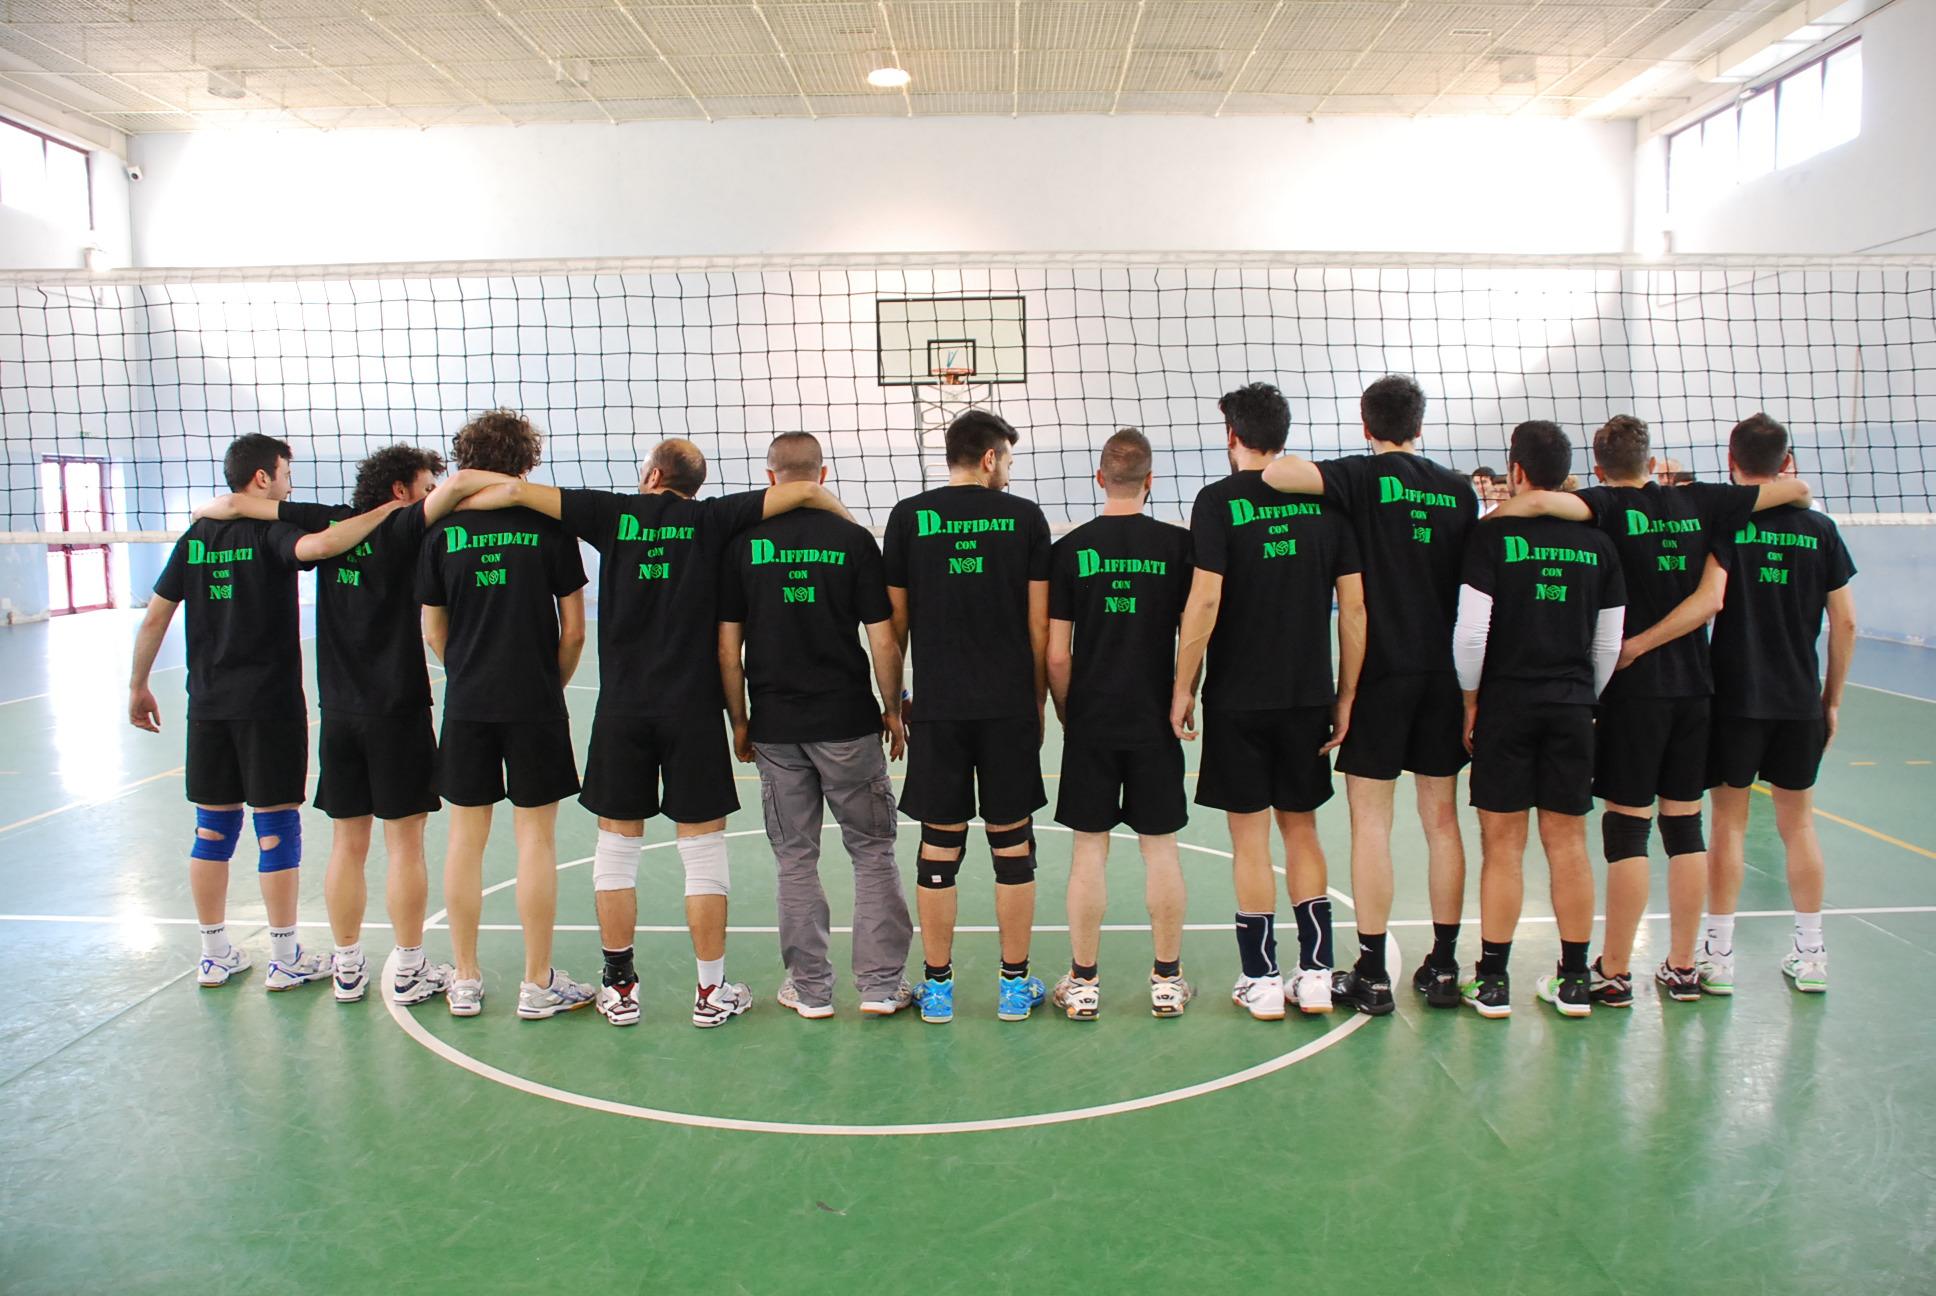 2014-03-22 - 1DIVM - Asd Venafro Volley vs Asd Termoli Pallavolo (14)